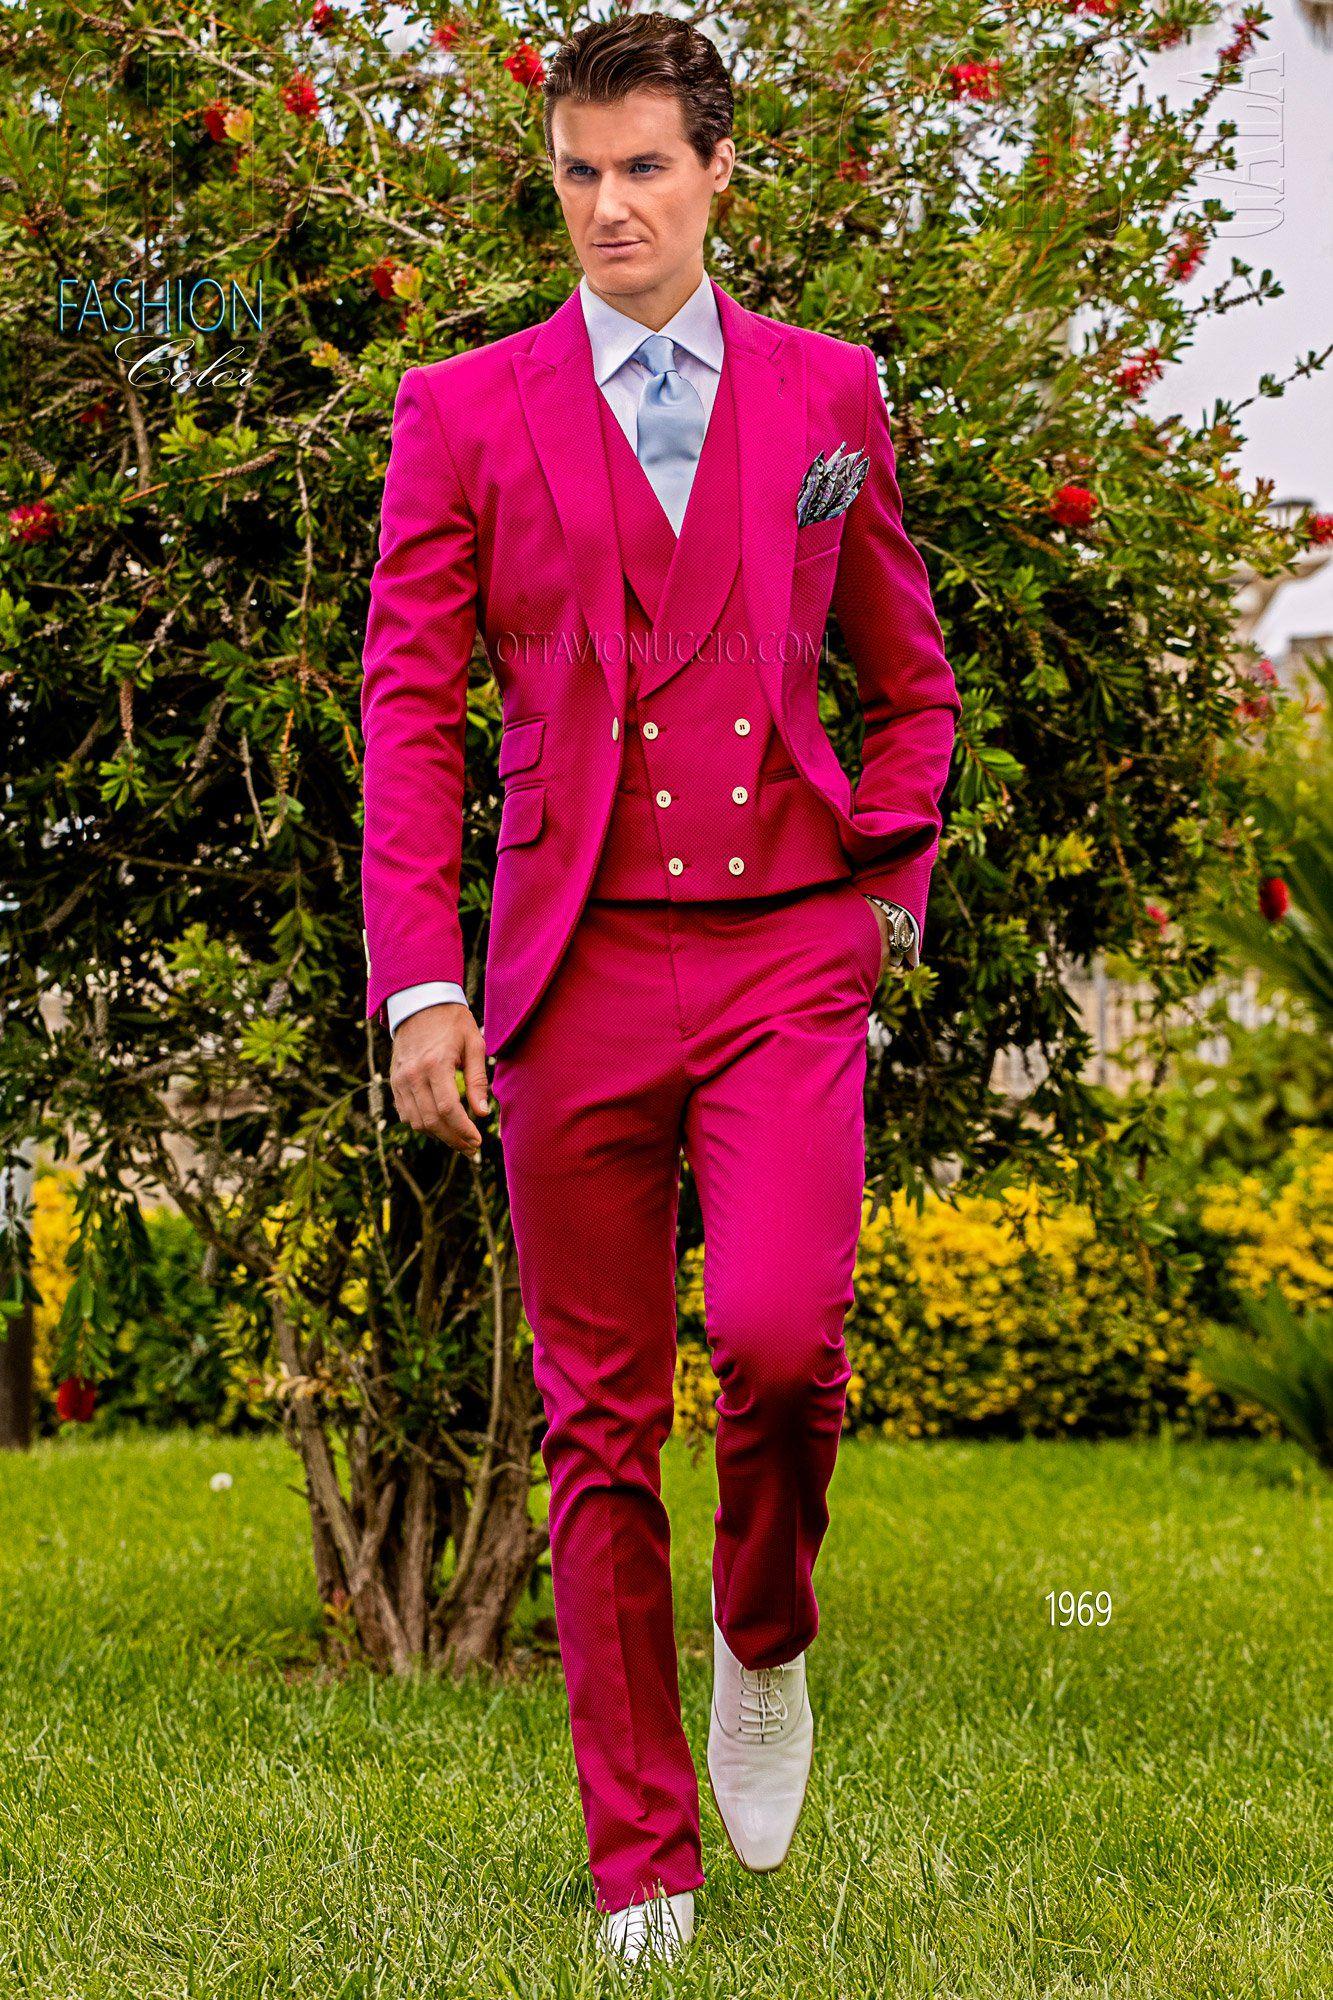 Fuchsia Hipster suit for groom #wedding #tuxedo #luxury #menswear ...